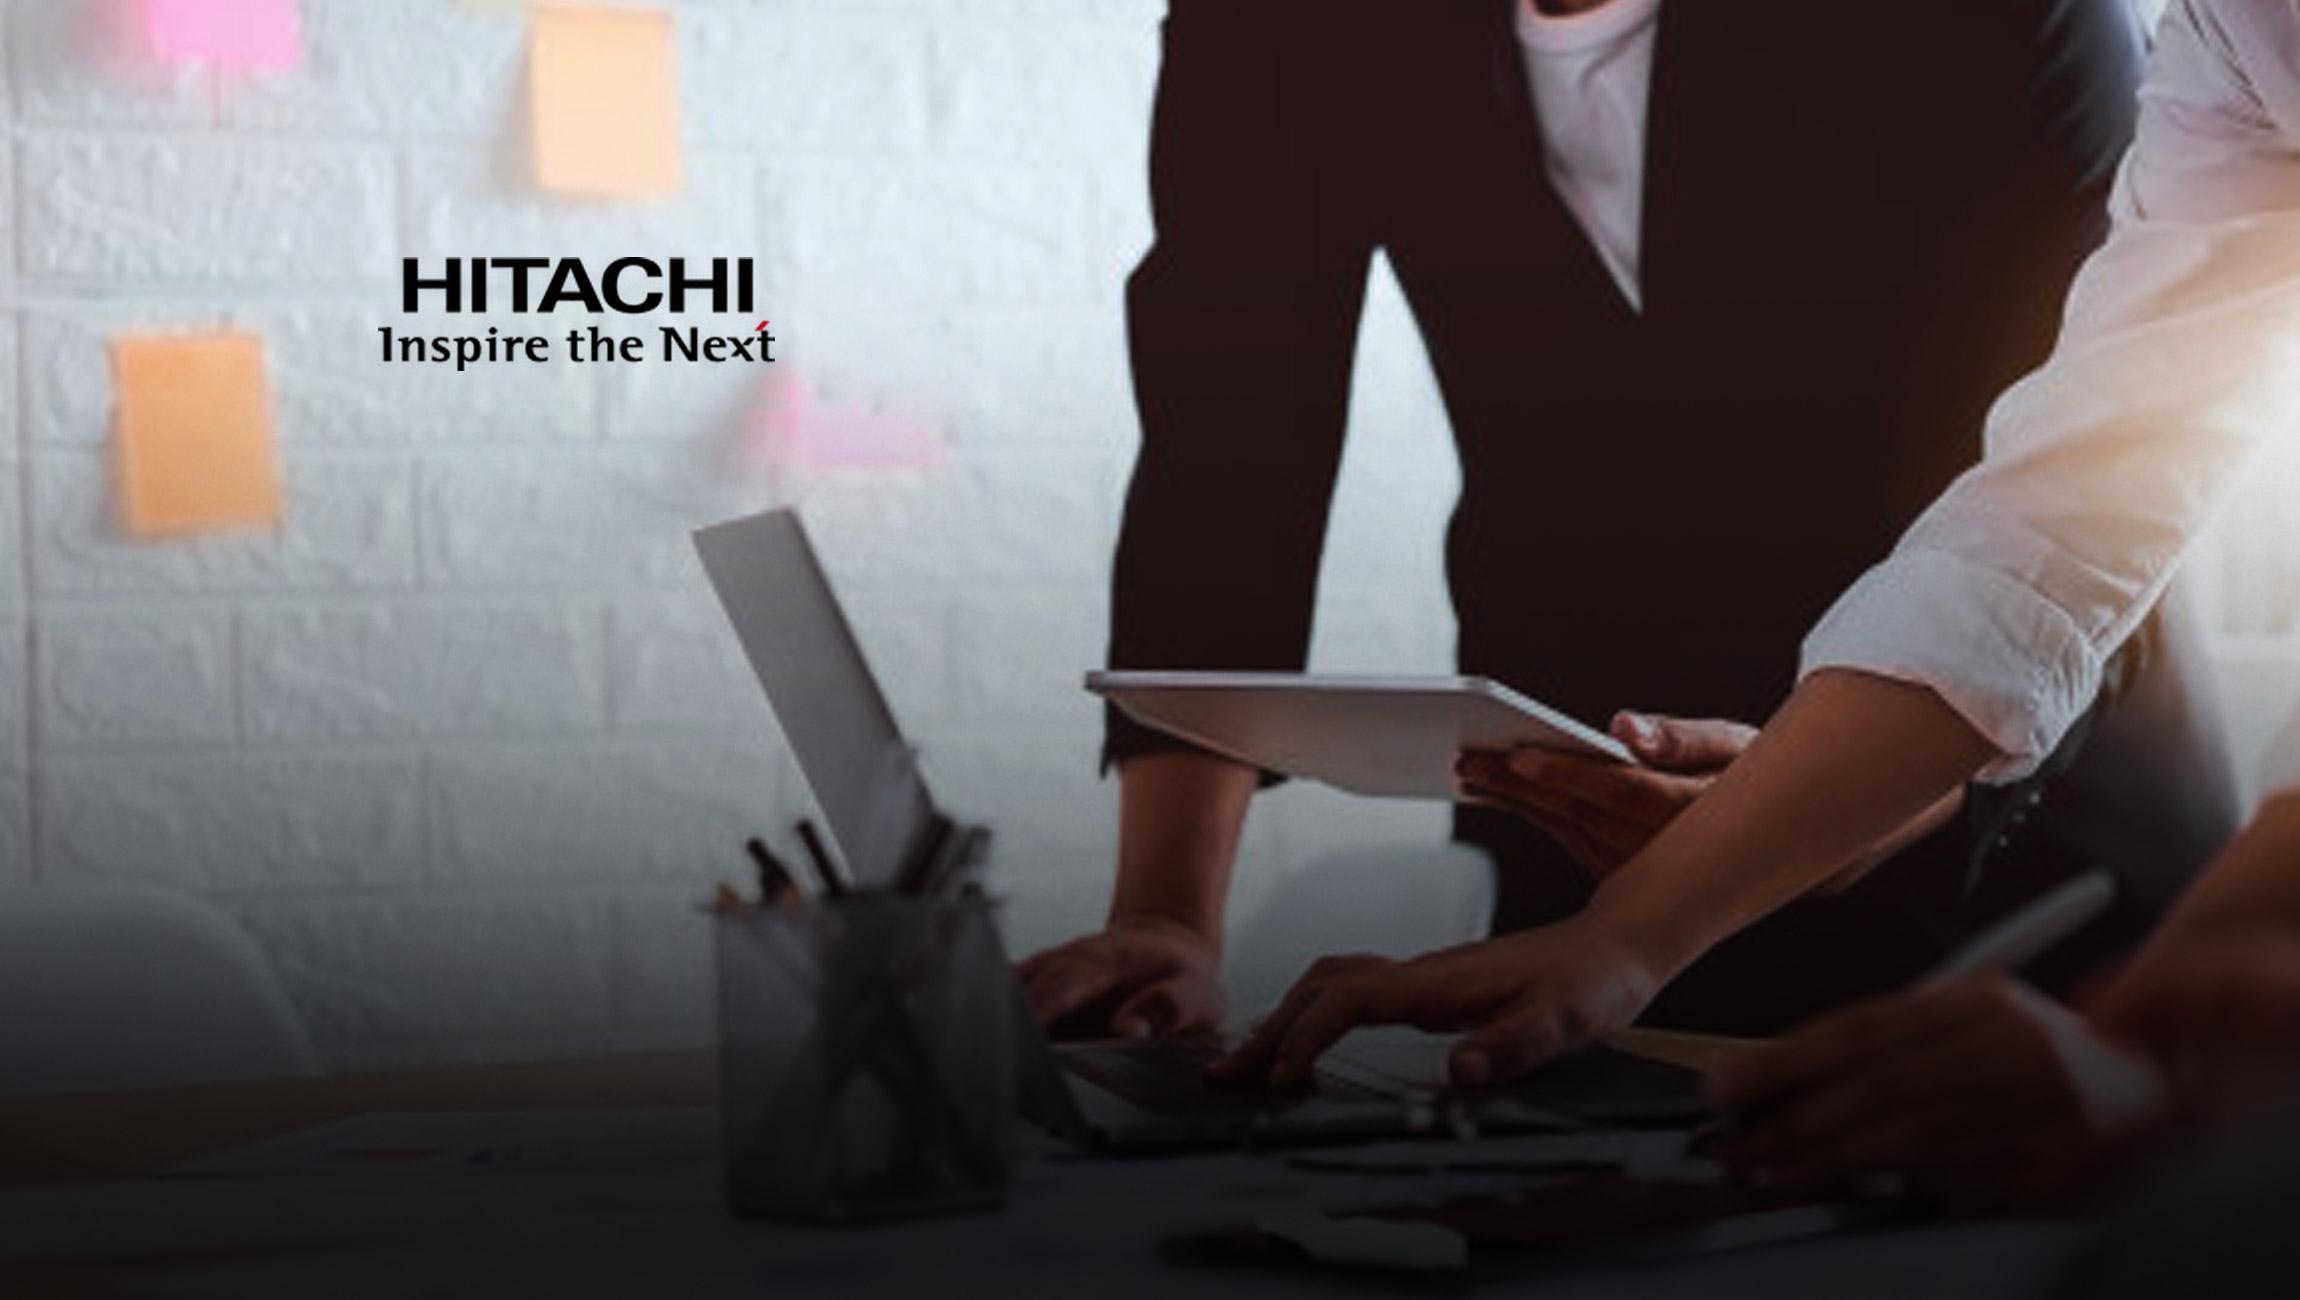 Hitachi Named a Leader in 2020 Gartner Magic Quadrant for Industrial IoT Platforms